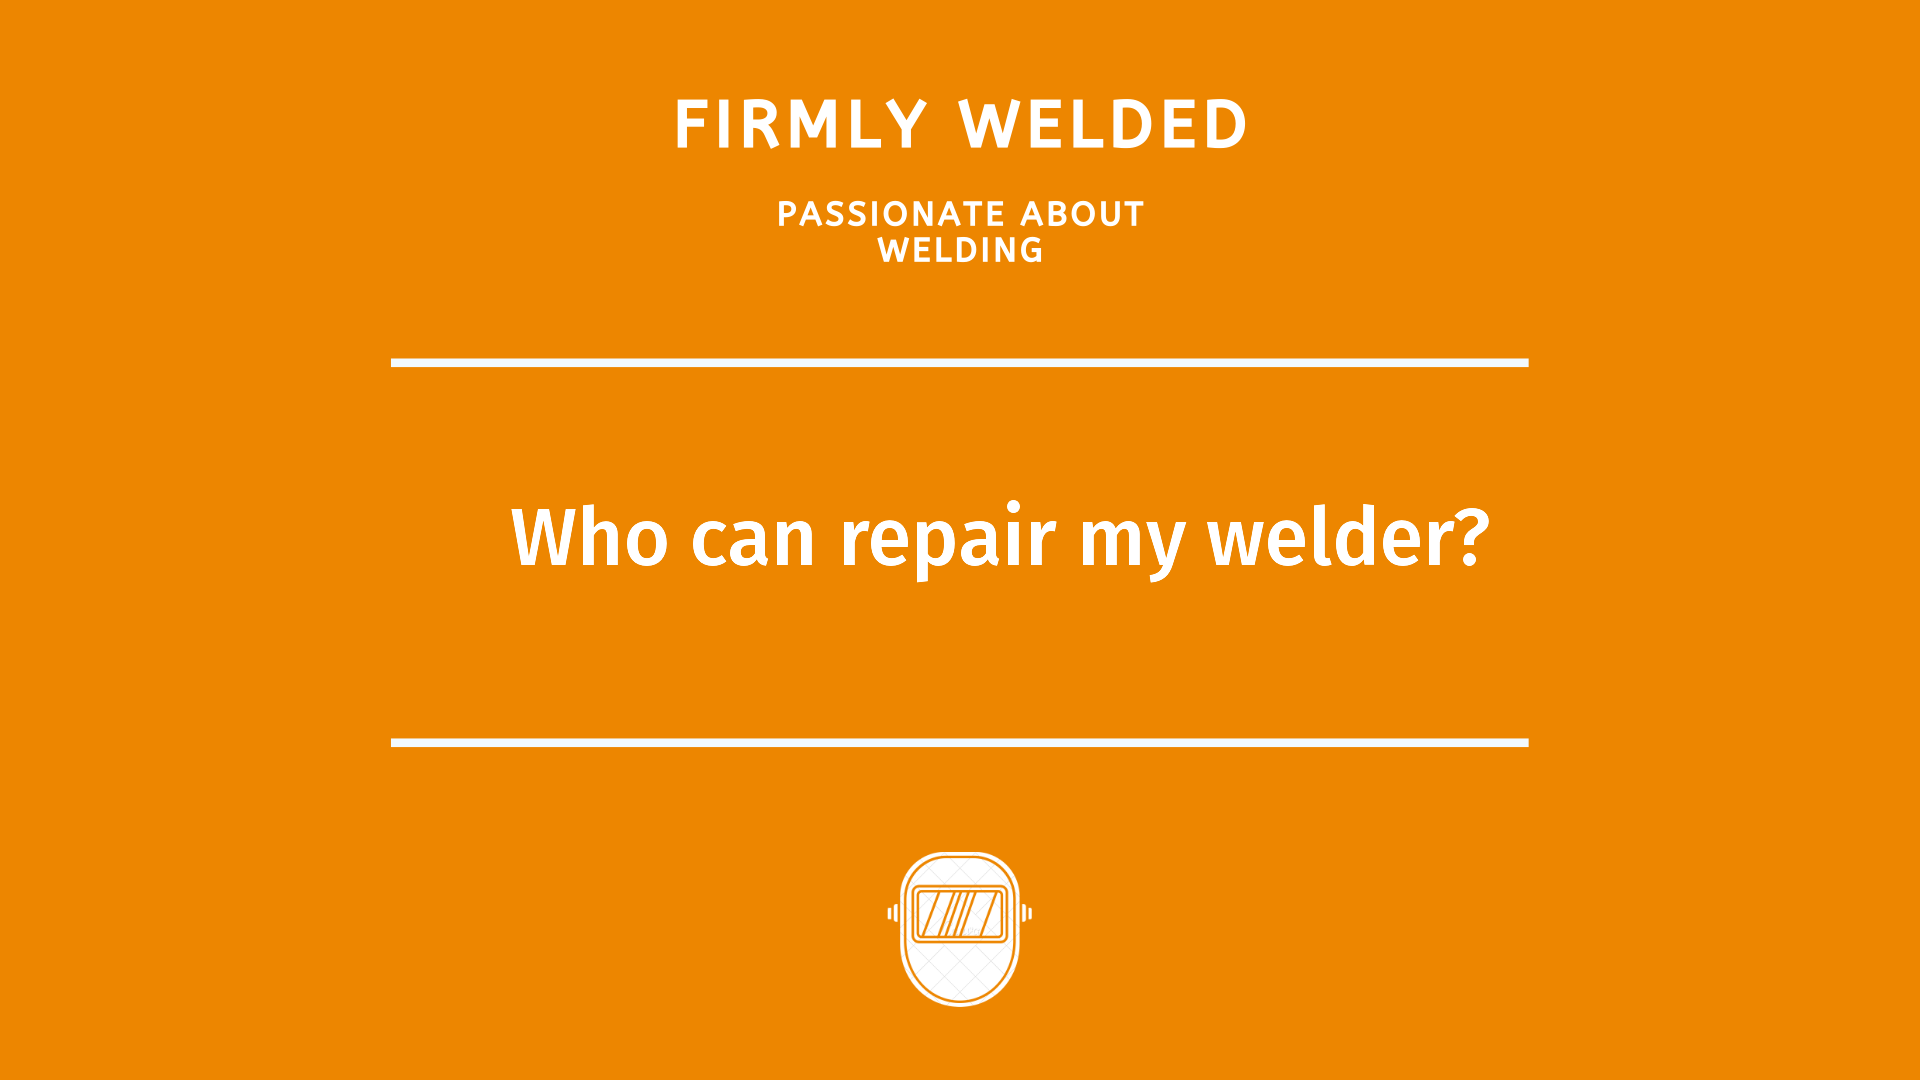 Who can repair my welder?